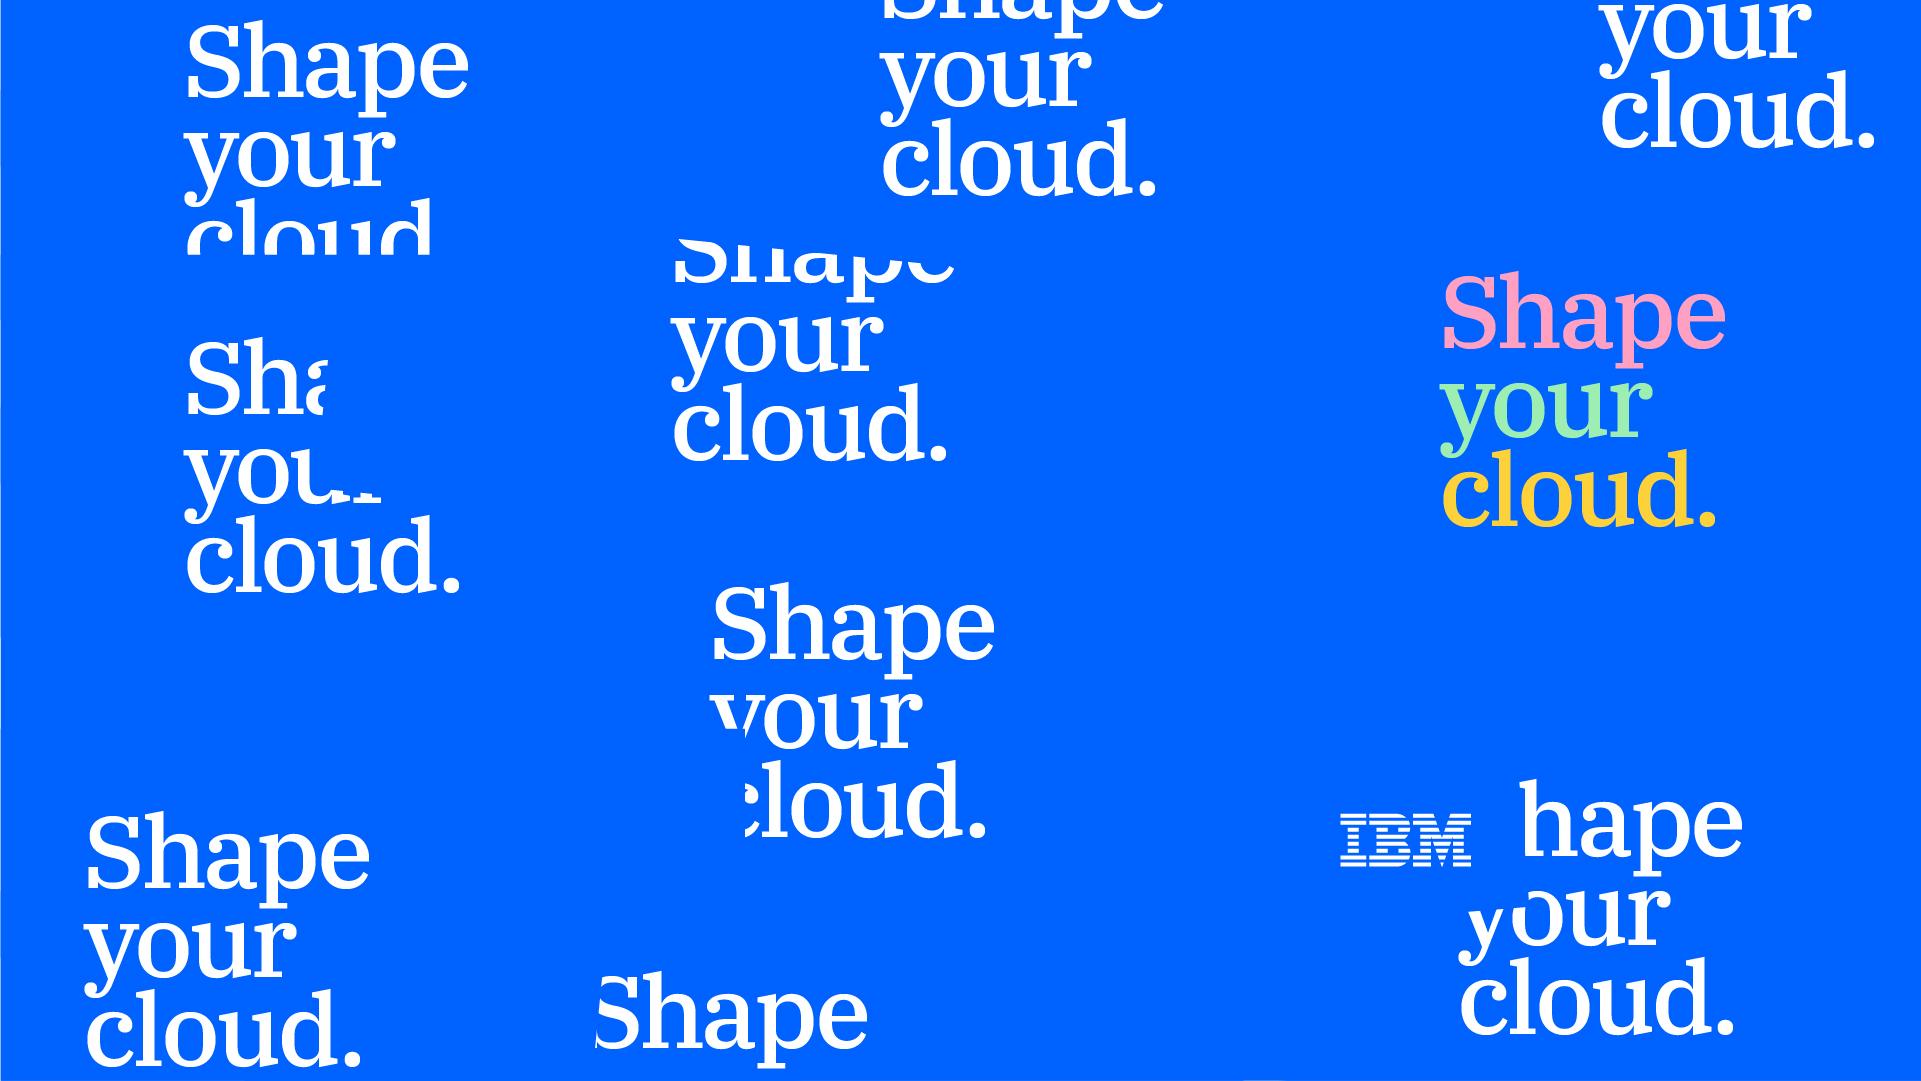 IBM_SHAPE-YOUR-CLOUD_DC_EDITS_BH_proceso_IBM-process-23.jpg